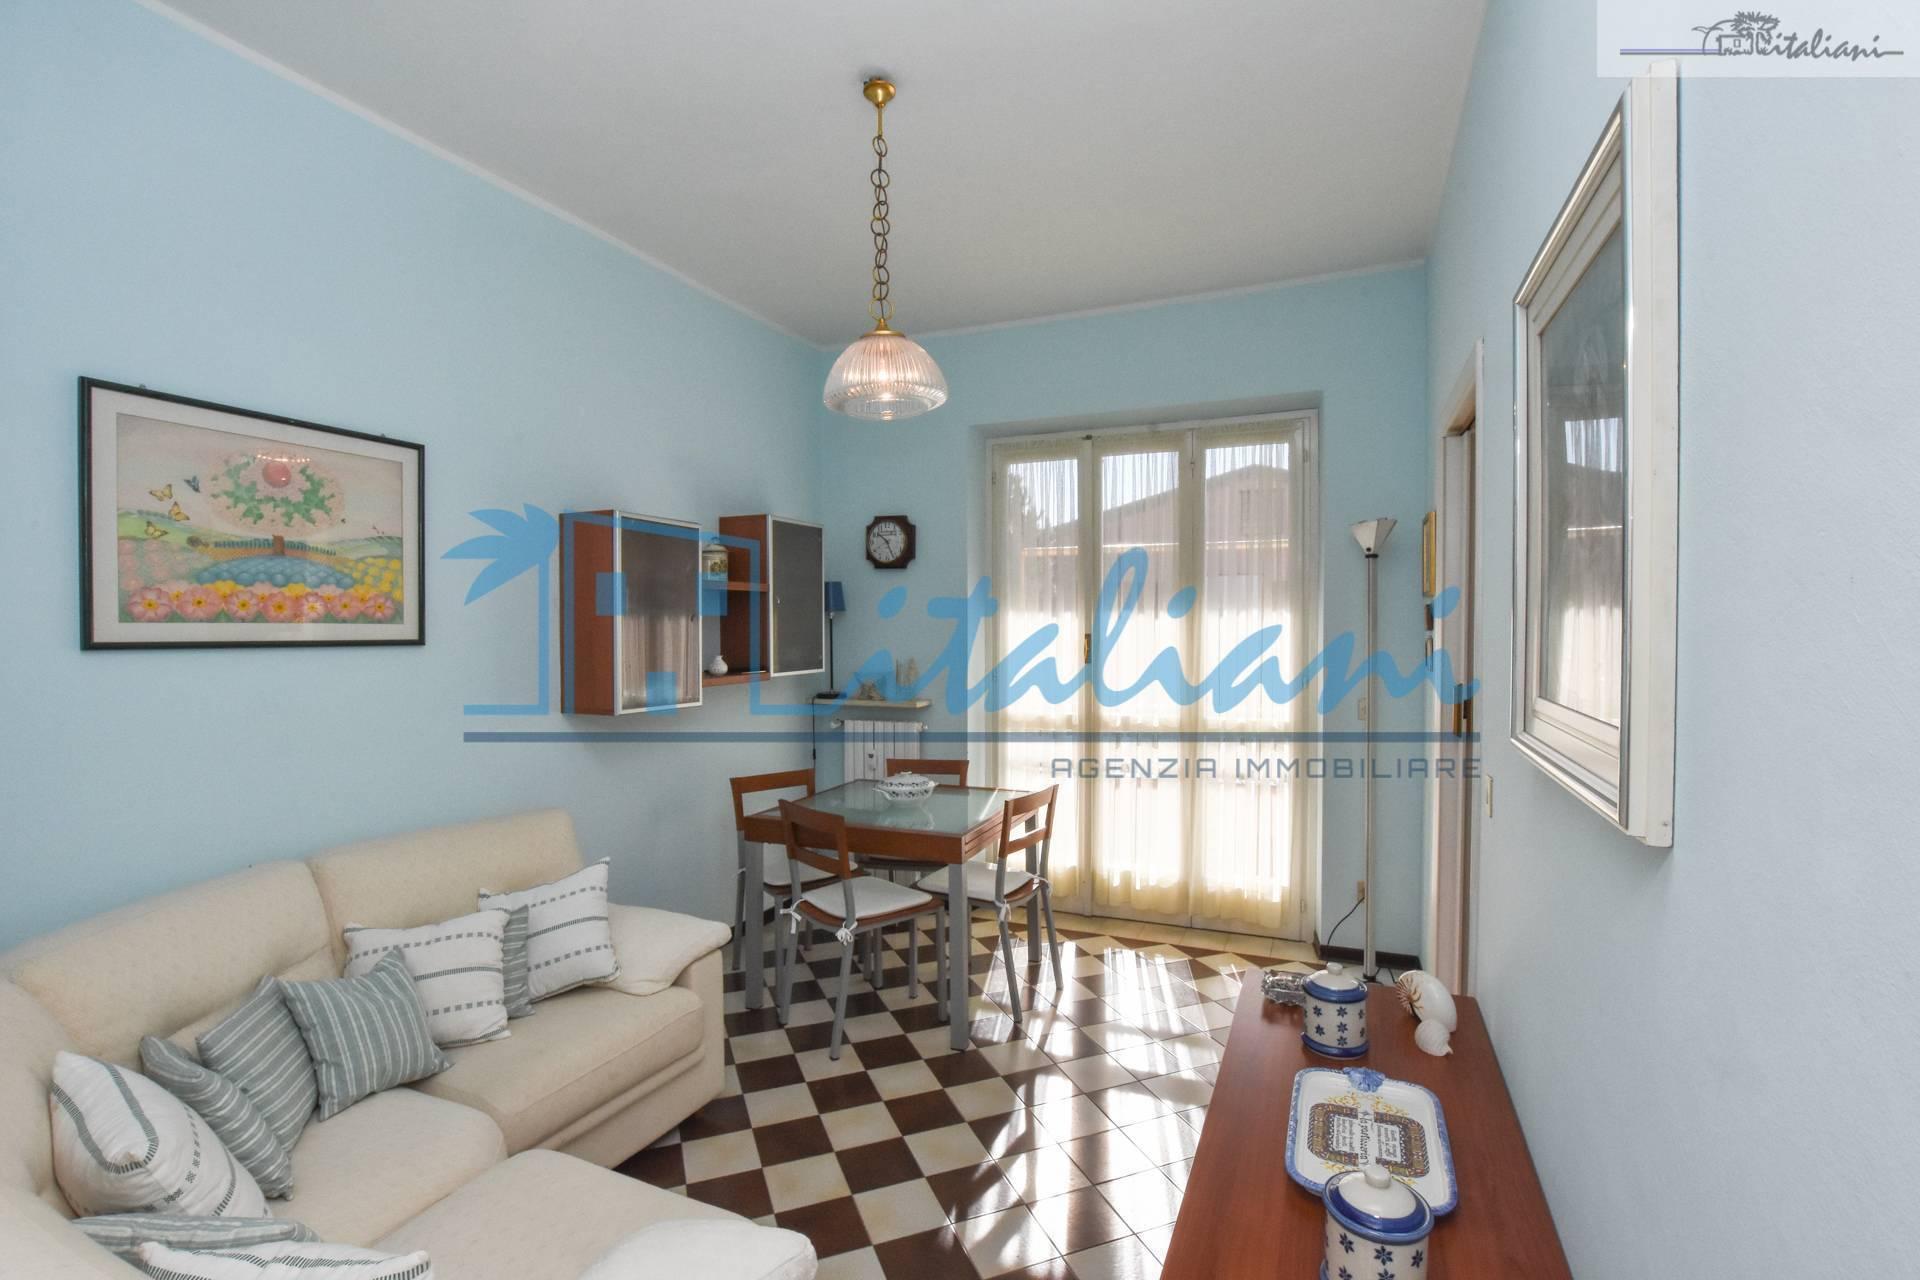 Agenzie Immobiliari Varazze appartamento in vendita a varazze cod. vag c32